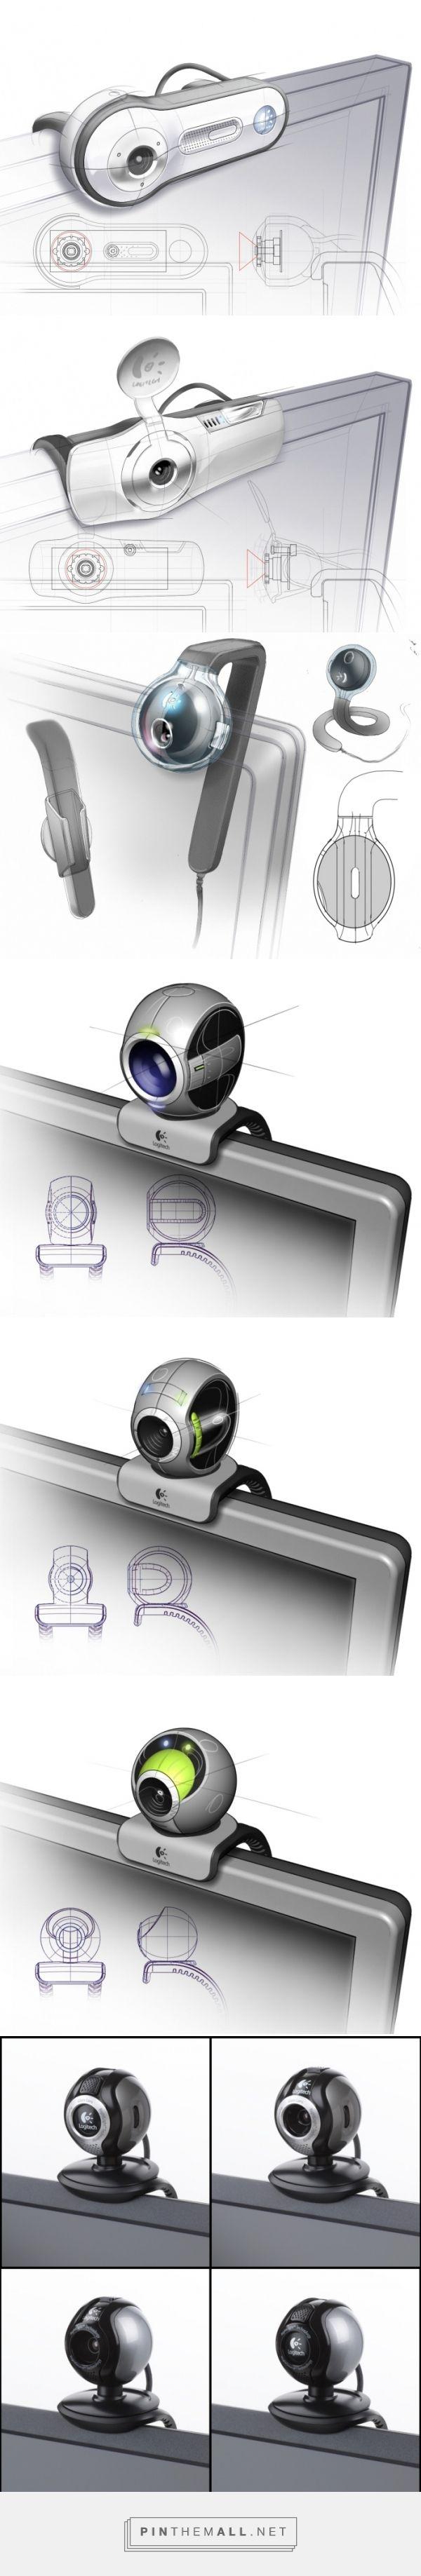 Logitech Webcams by Andy Logan at Coroflot.com - created via http://pinthemall.net